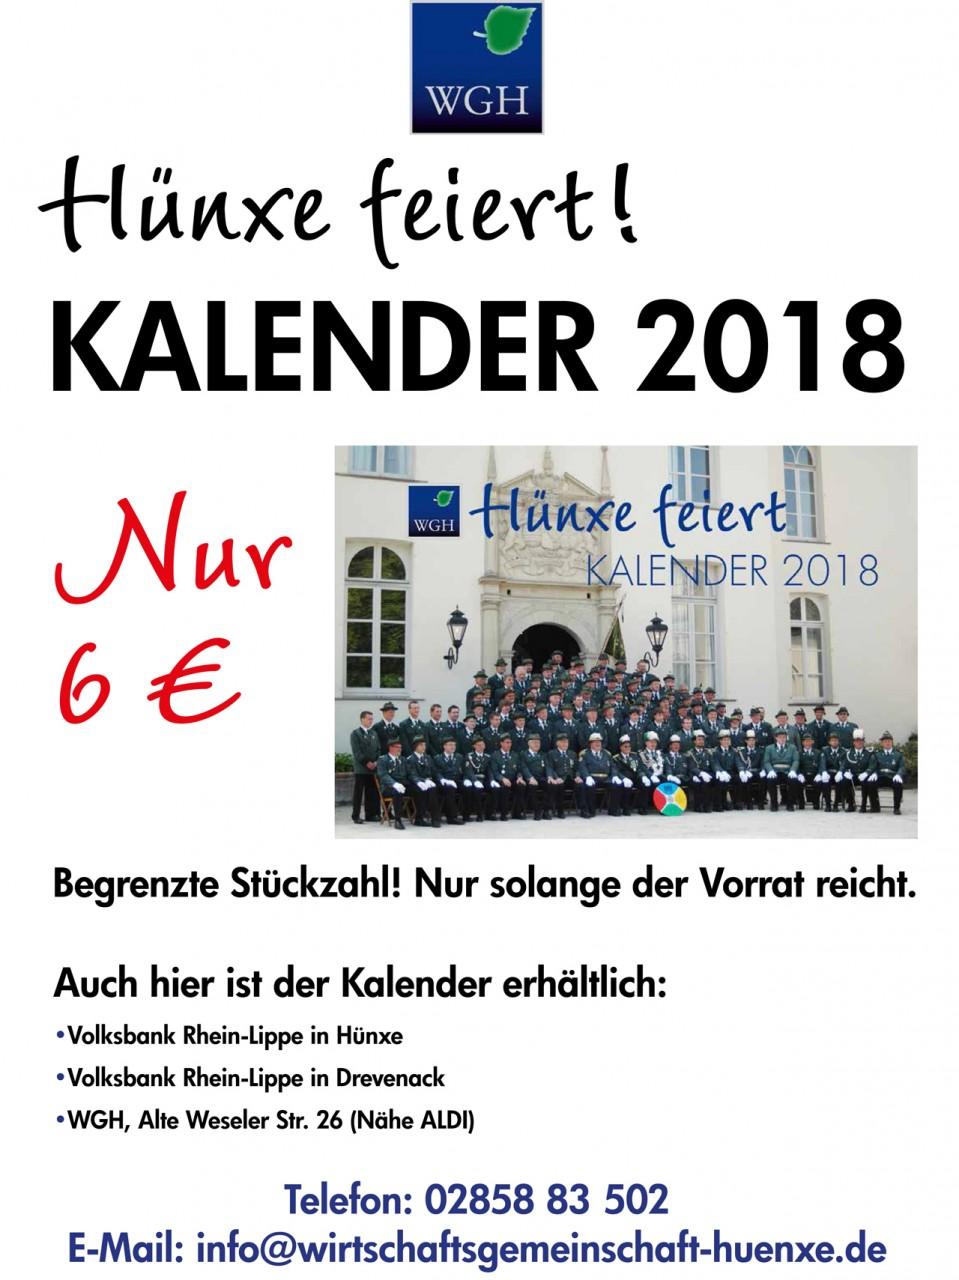 A3-Fotokalender 2018